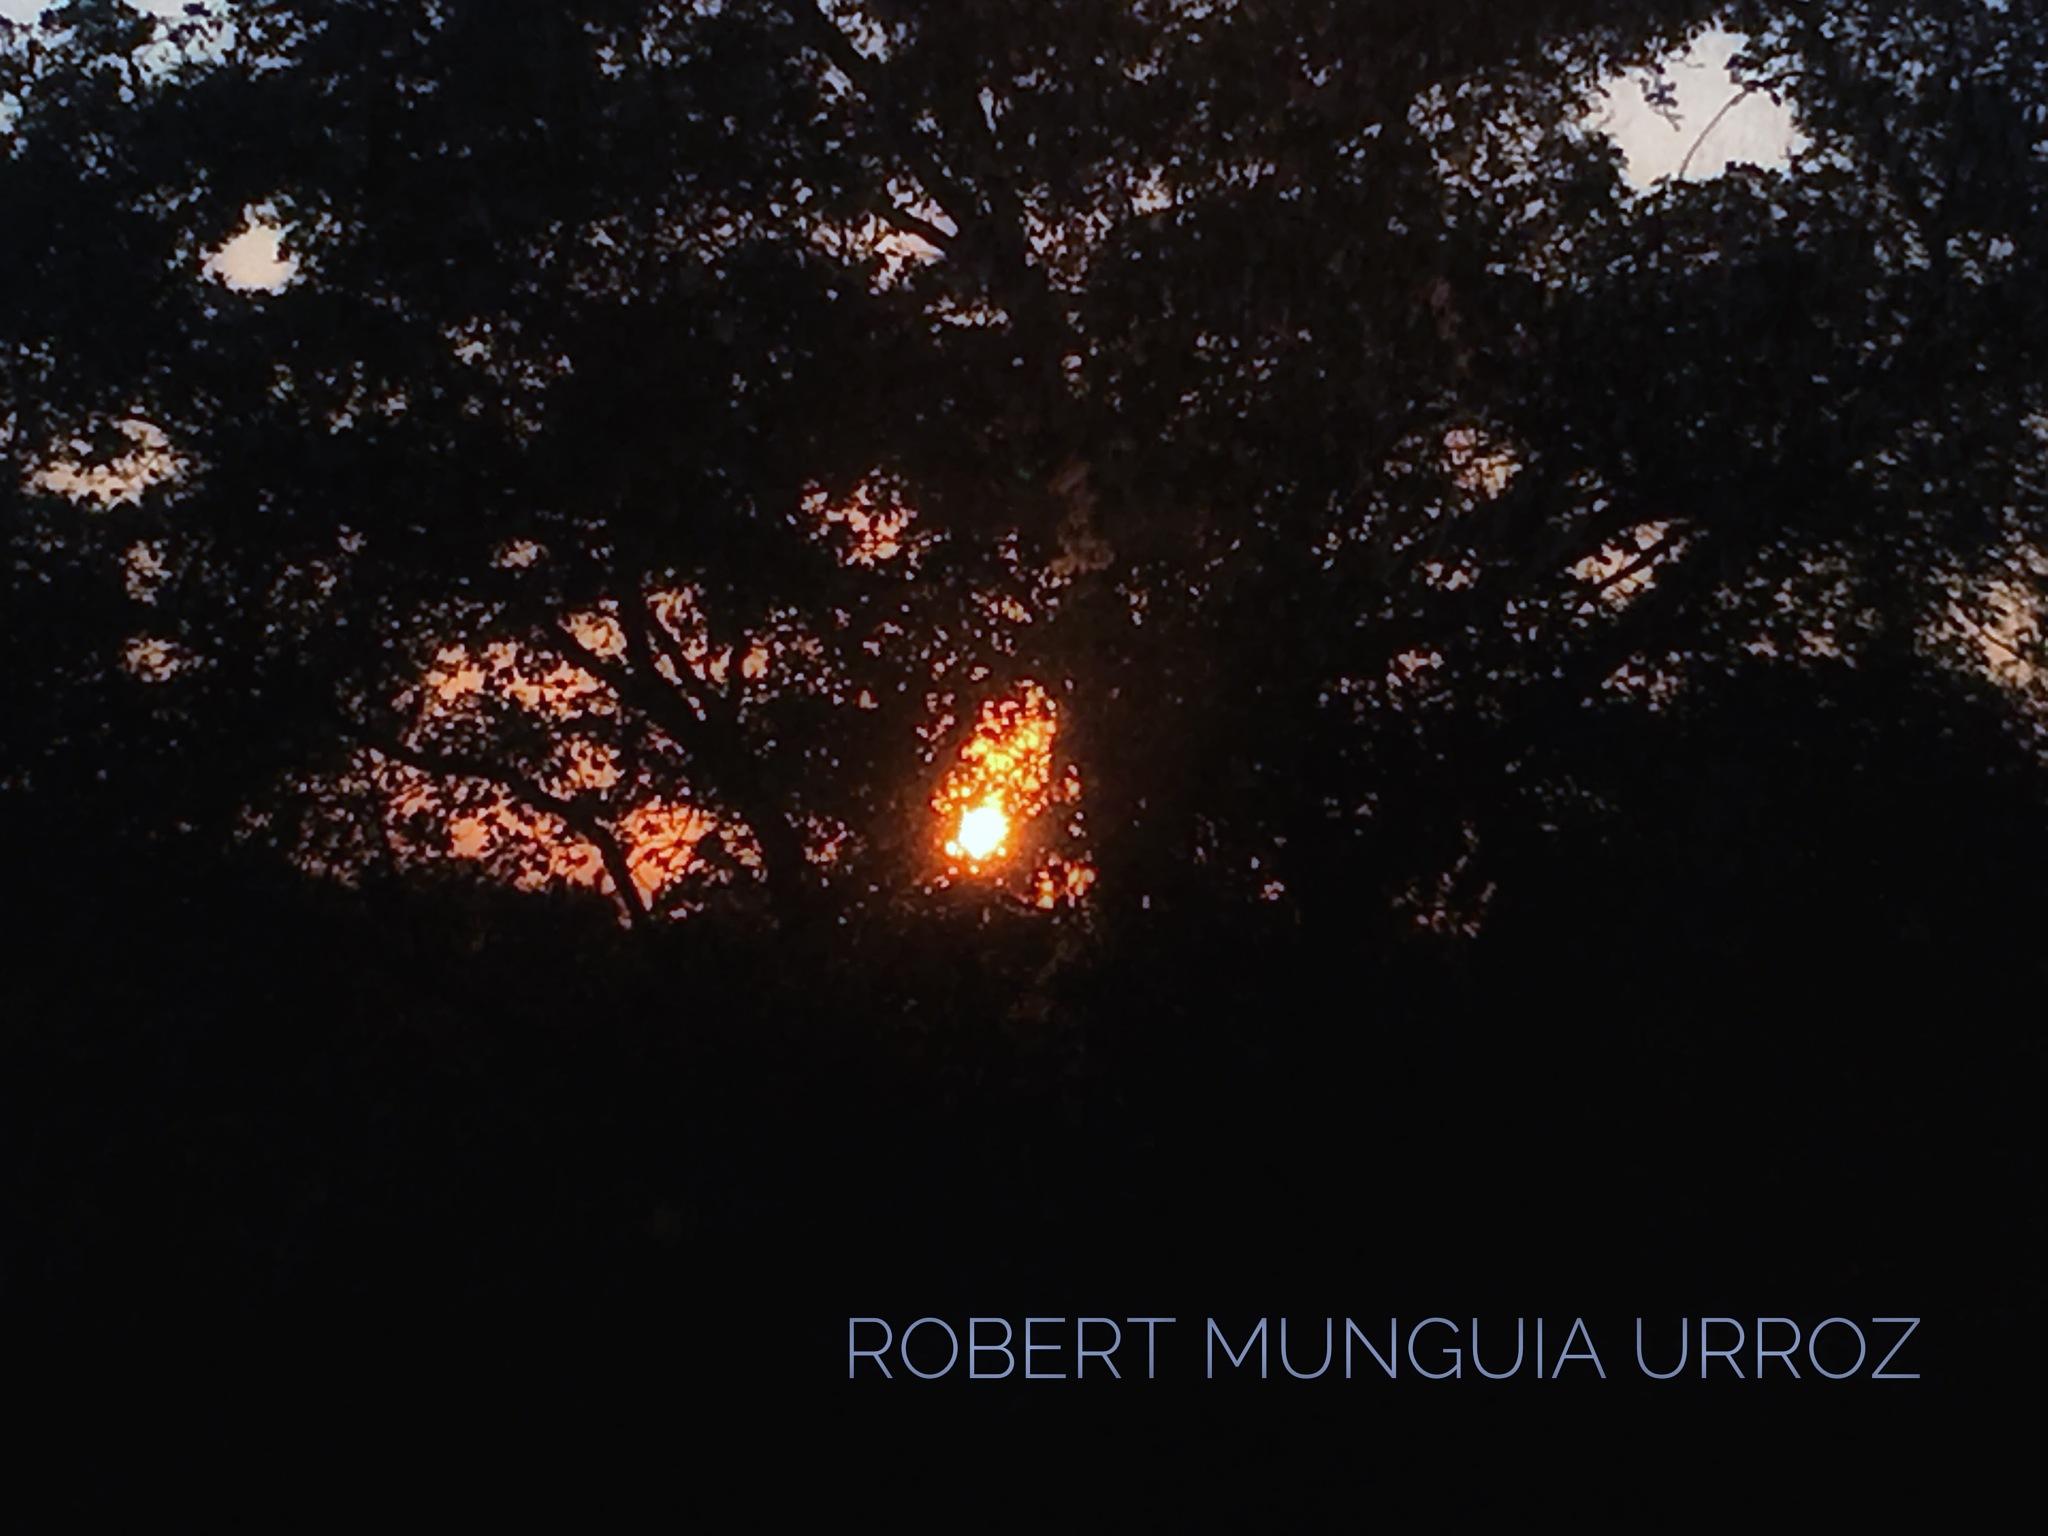 Sunset by Robert Munguia